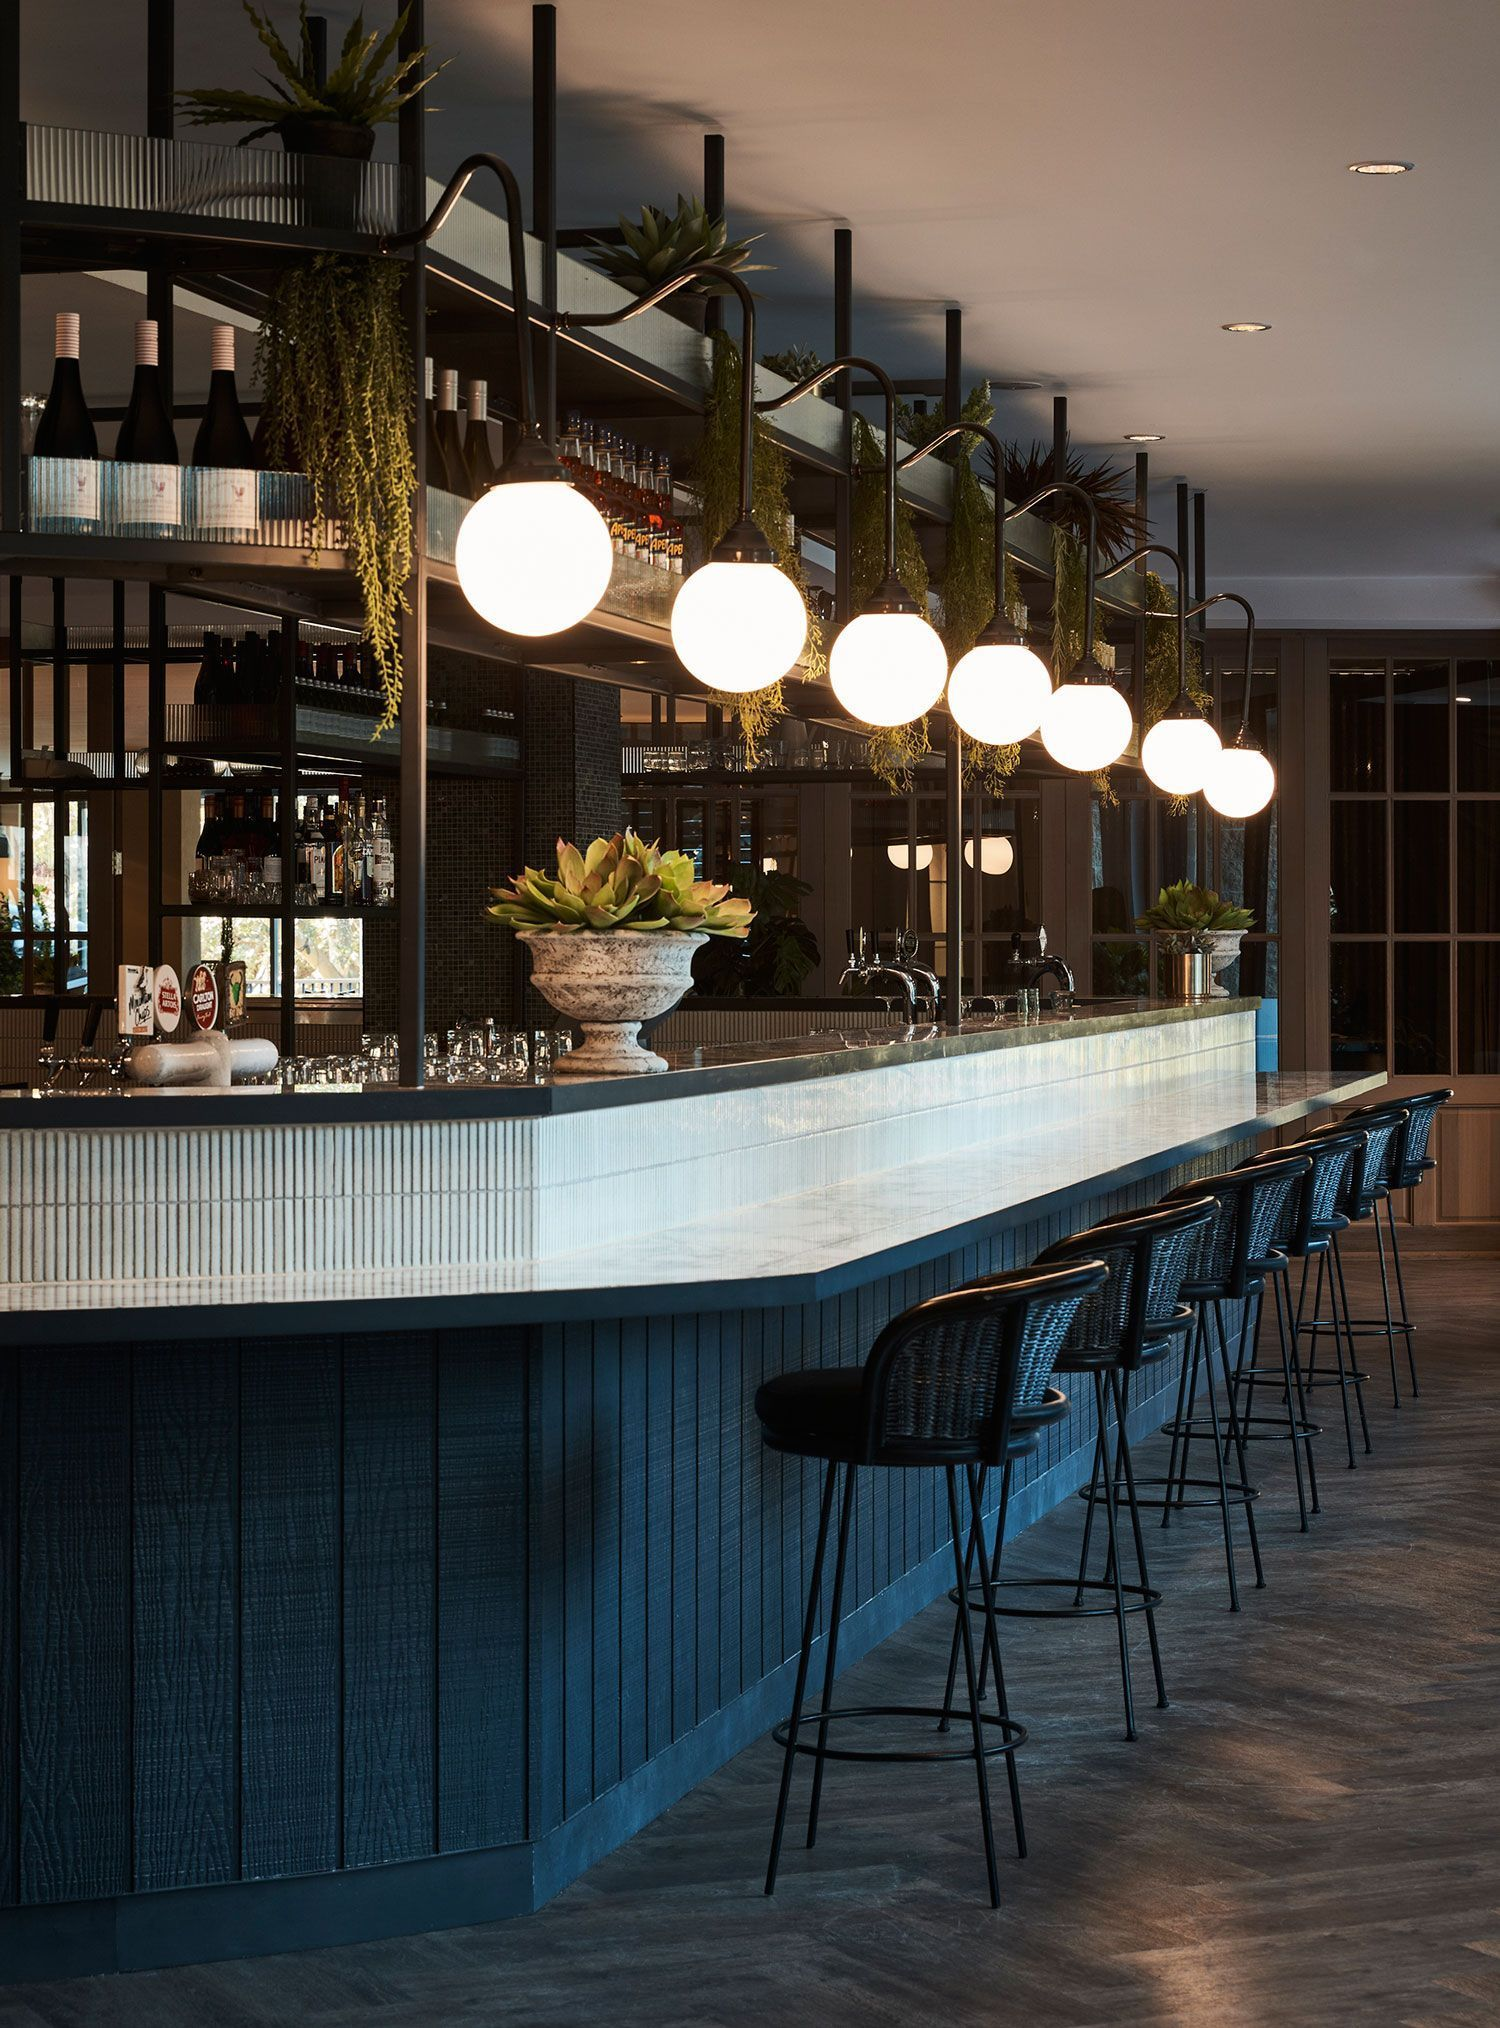 The Most Inspiring Home Design Projects Following The Latest Trends Vintage Industrial Style Vin Bar Design Restaurant Bar Interior Design Restaurant Design